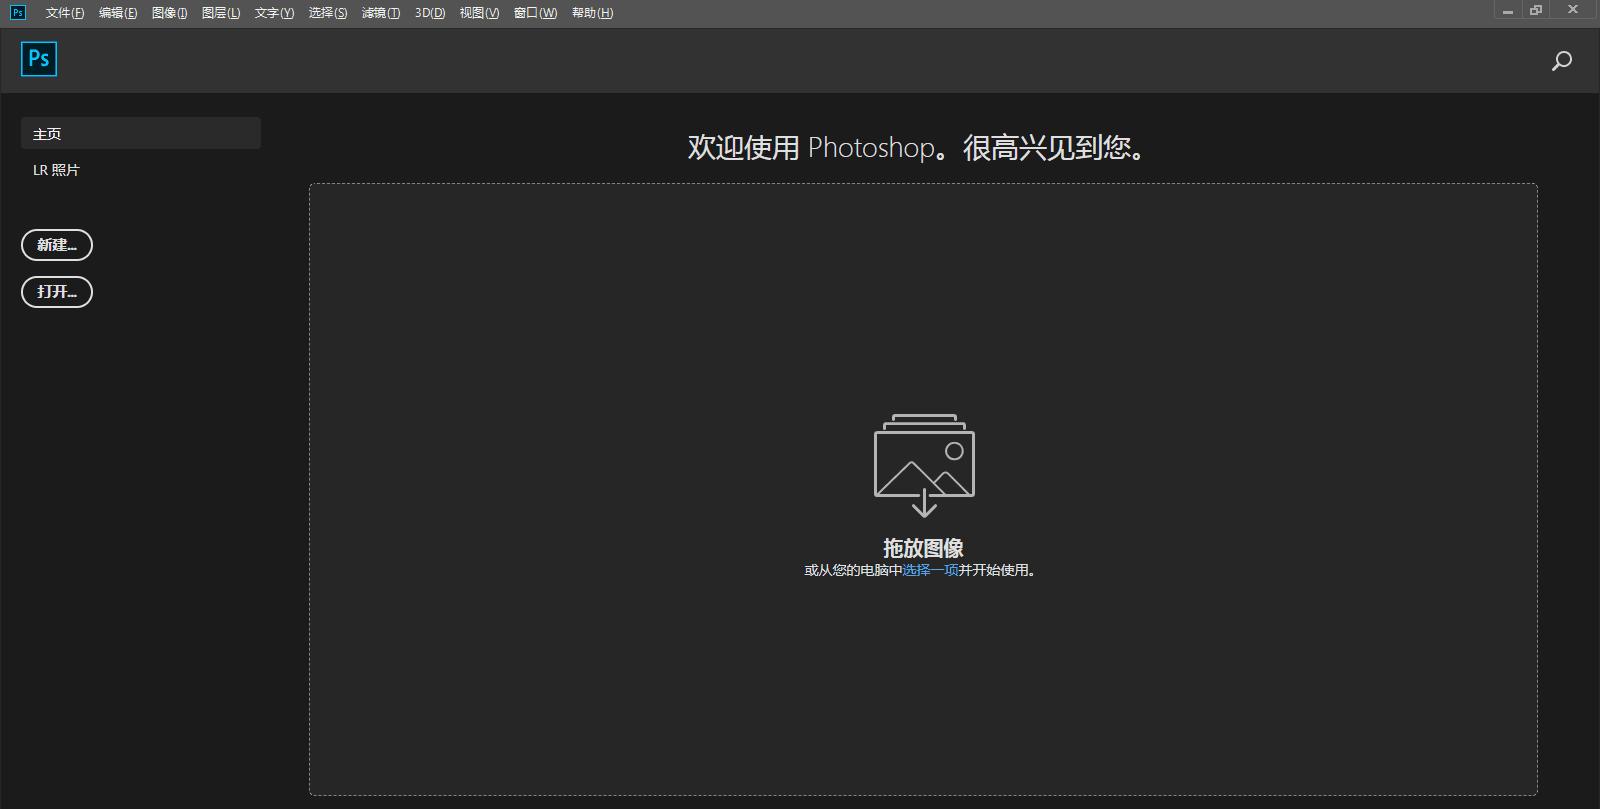 Photoshop CC 2019 中文免激活版【附Dr4.5修图插件】插图3